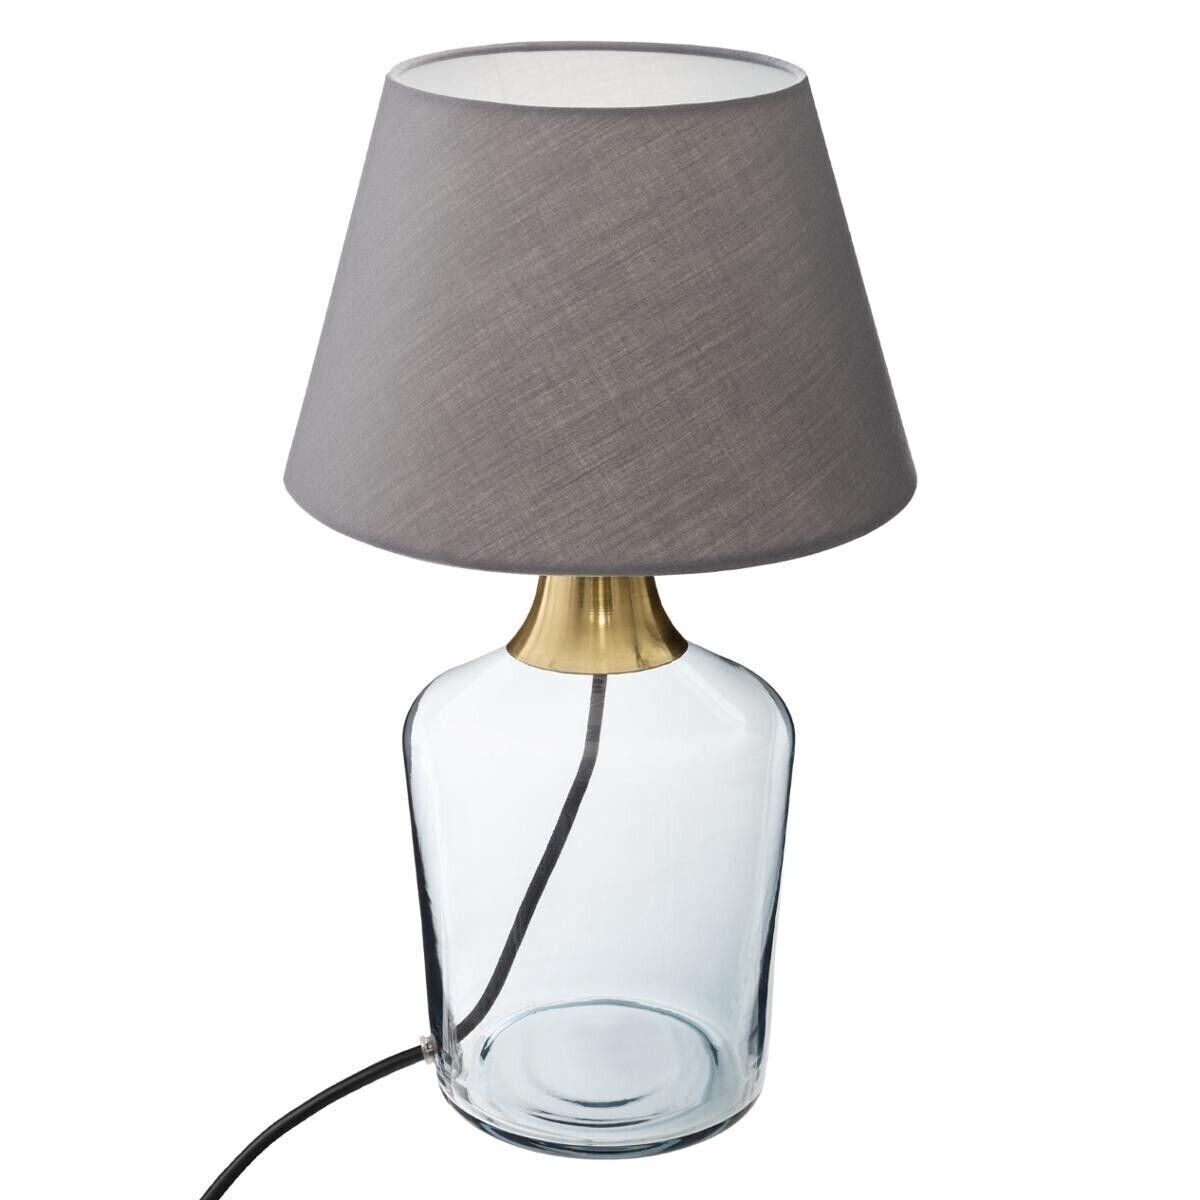 "Atmosphera Lampe ""Sila"" taupe et doré, verre H39 cm"